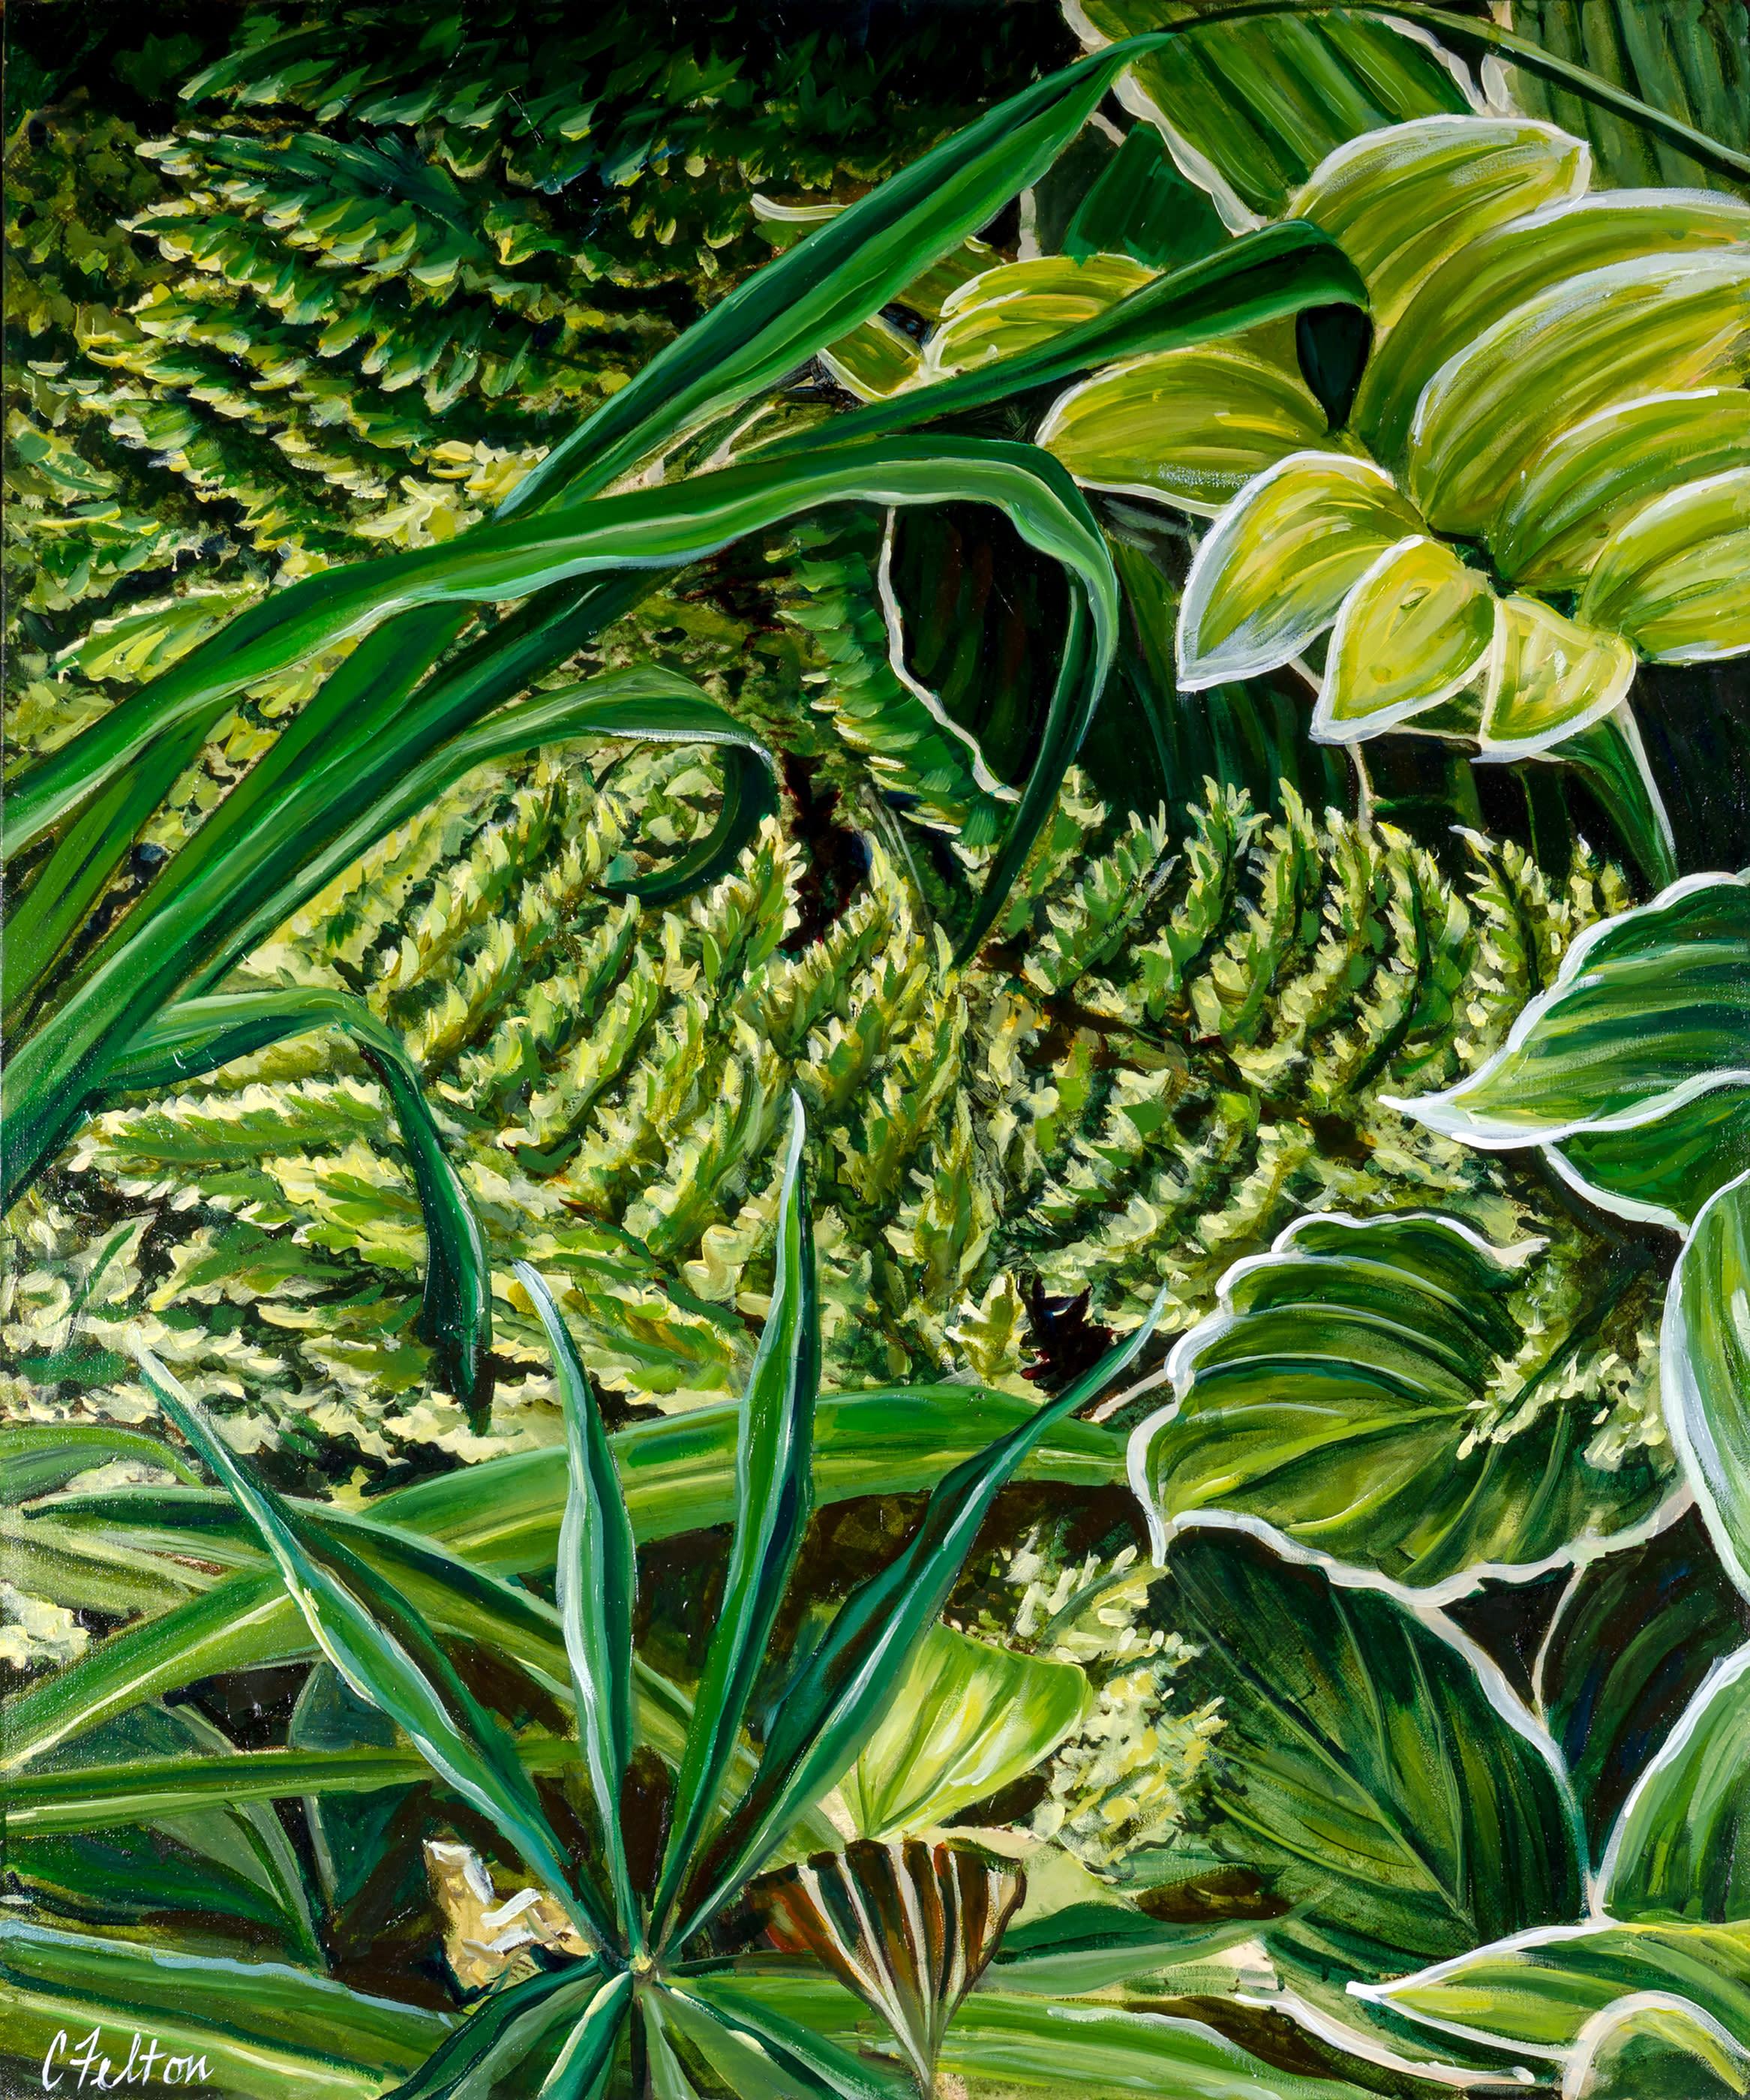 Rainforest 1 for original folder hhngfl